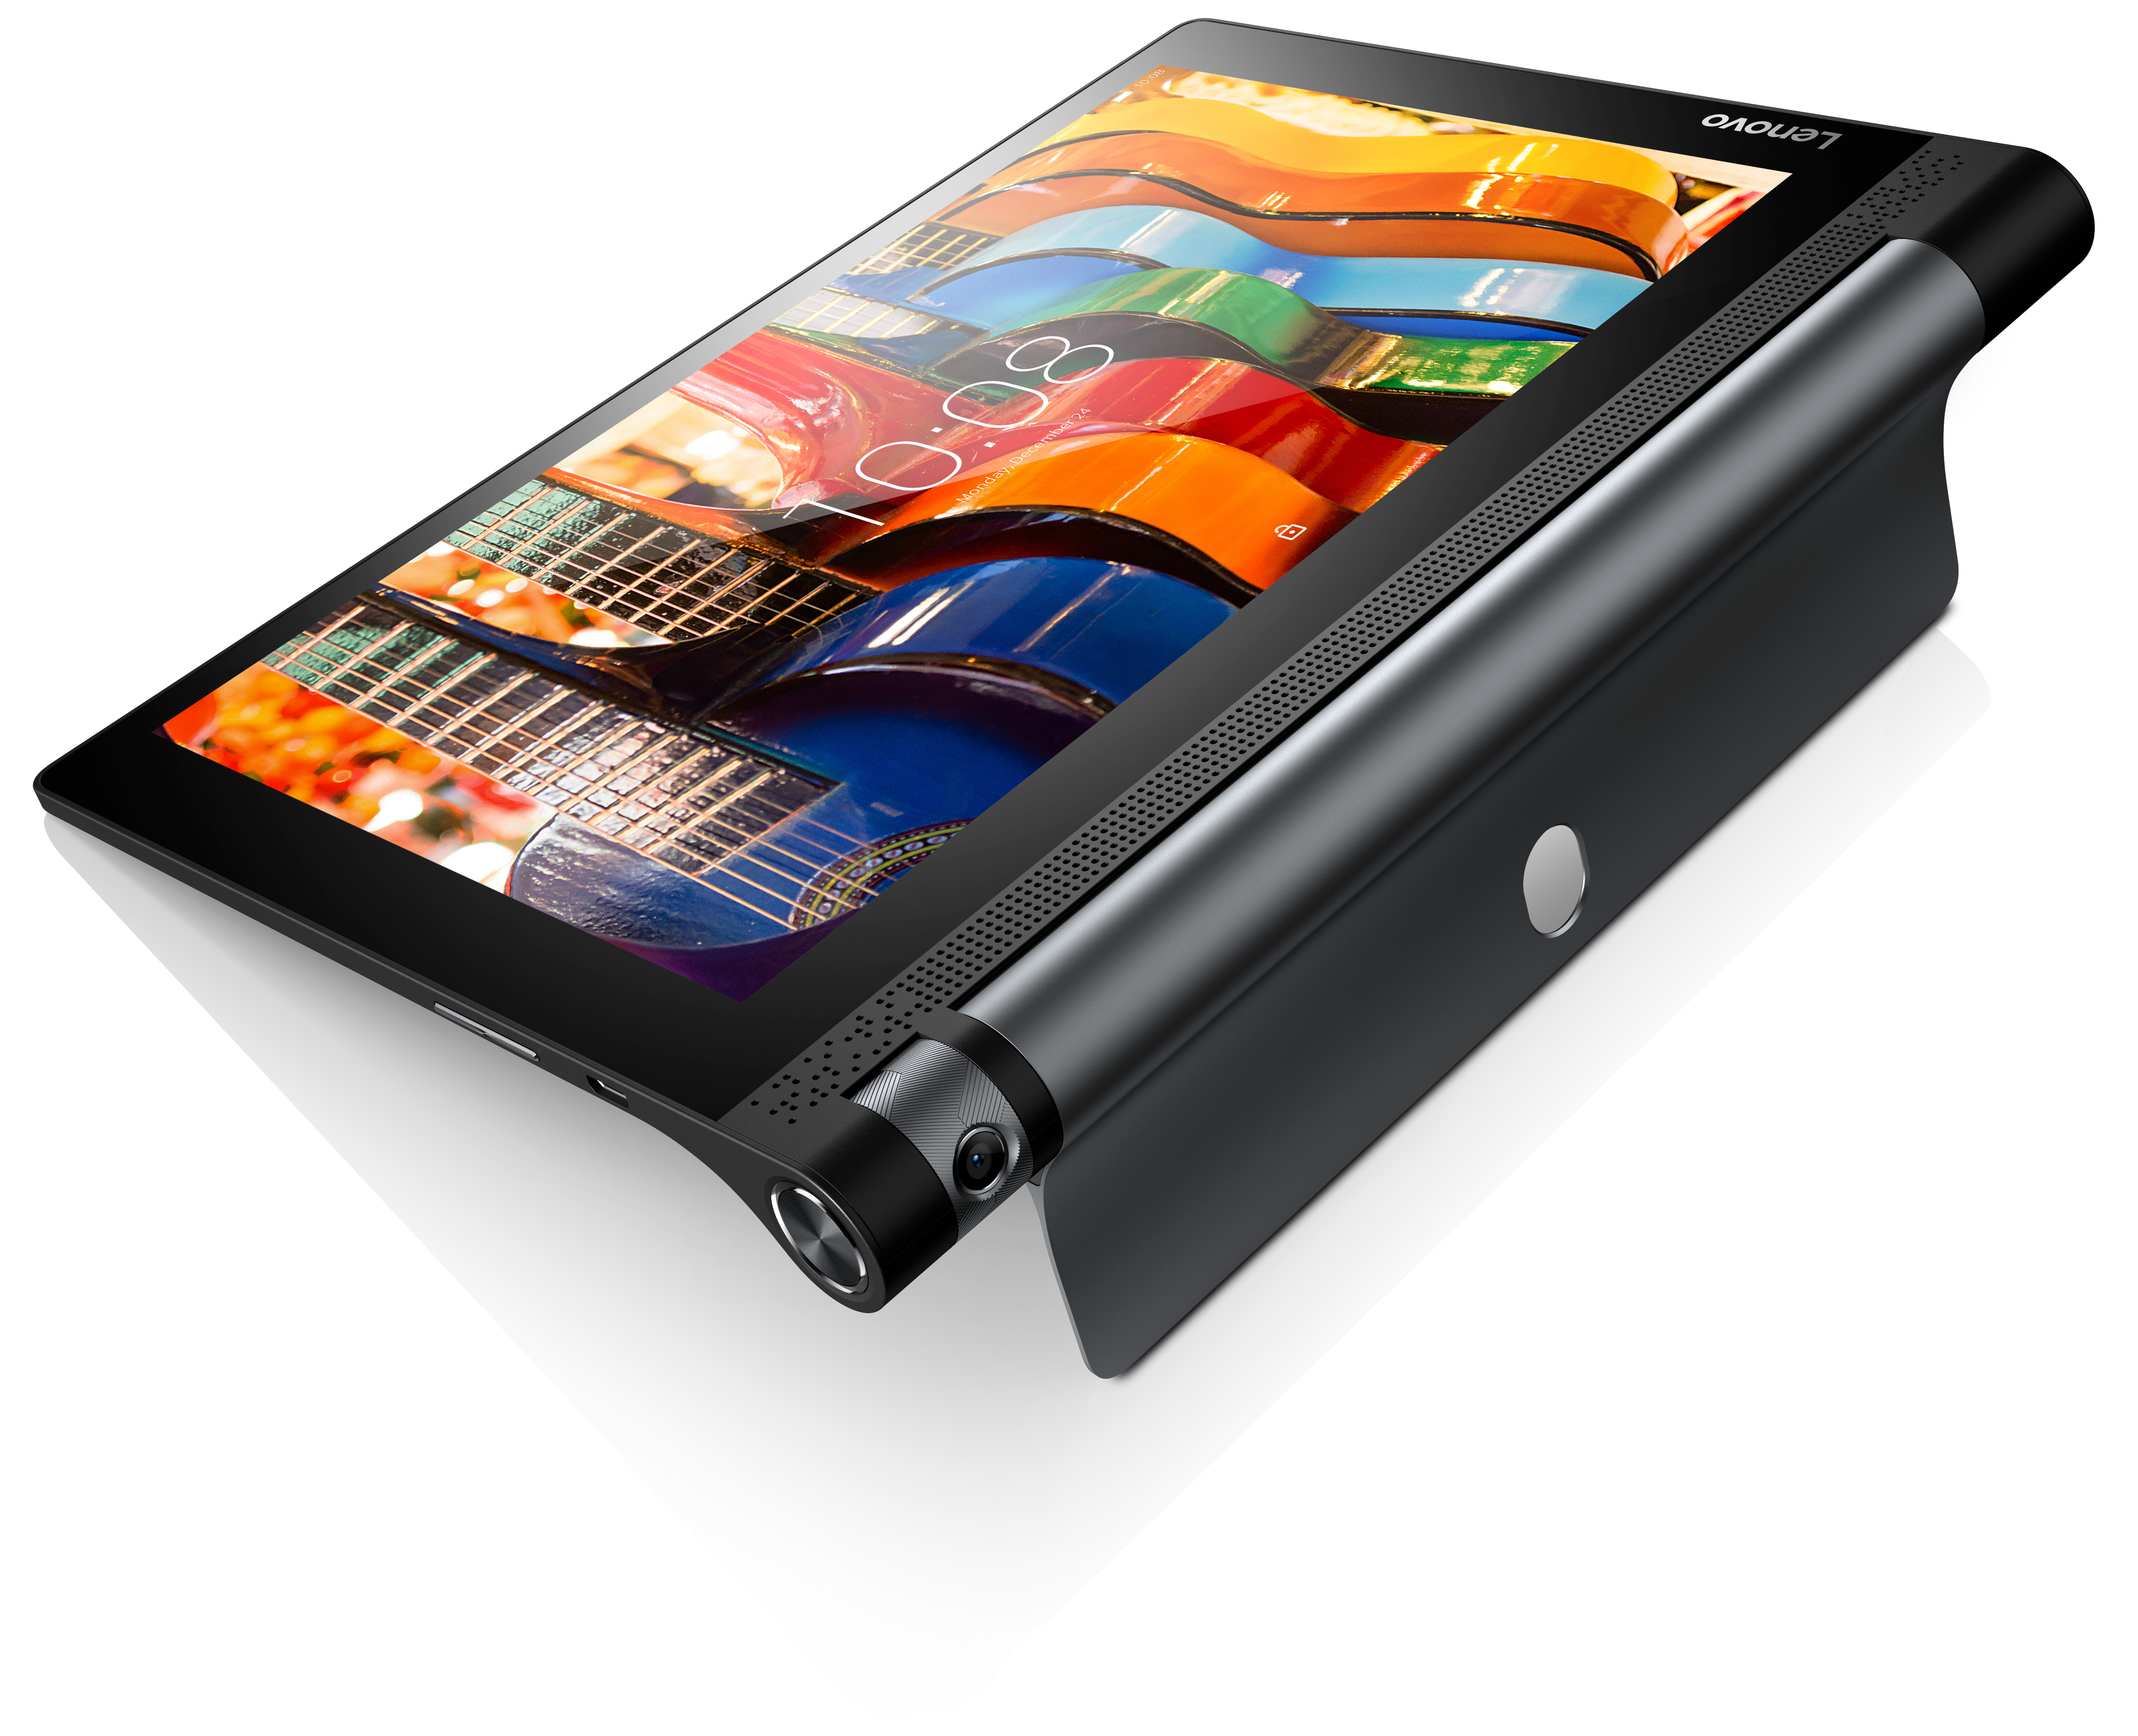 Lenovo Yoga 3 10 Wi-Fi 2GB / 16GB (ZA0H0057CZ) Black